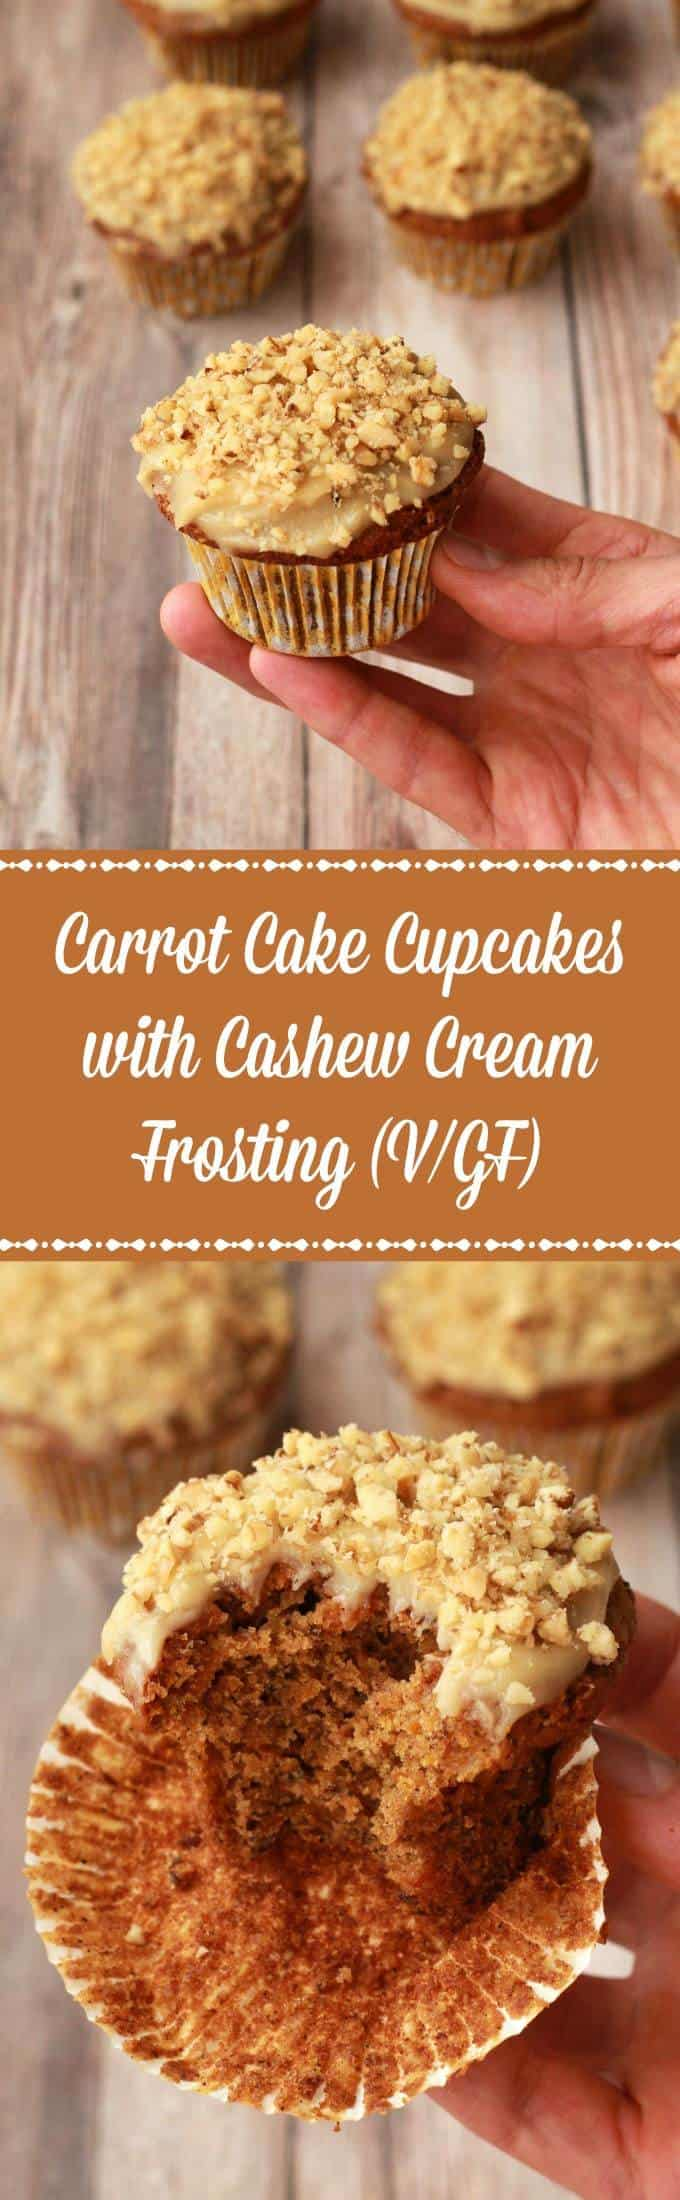 Gluten-Free Carrot Cake Cupcakes with Cashew Cream Frosting #vegan #lovingitvegan #glutenfree #carrotcake #cupcakes #dessert